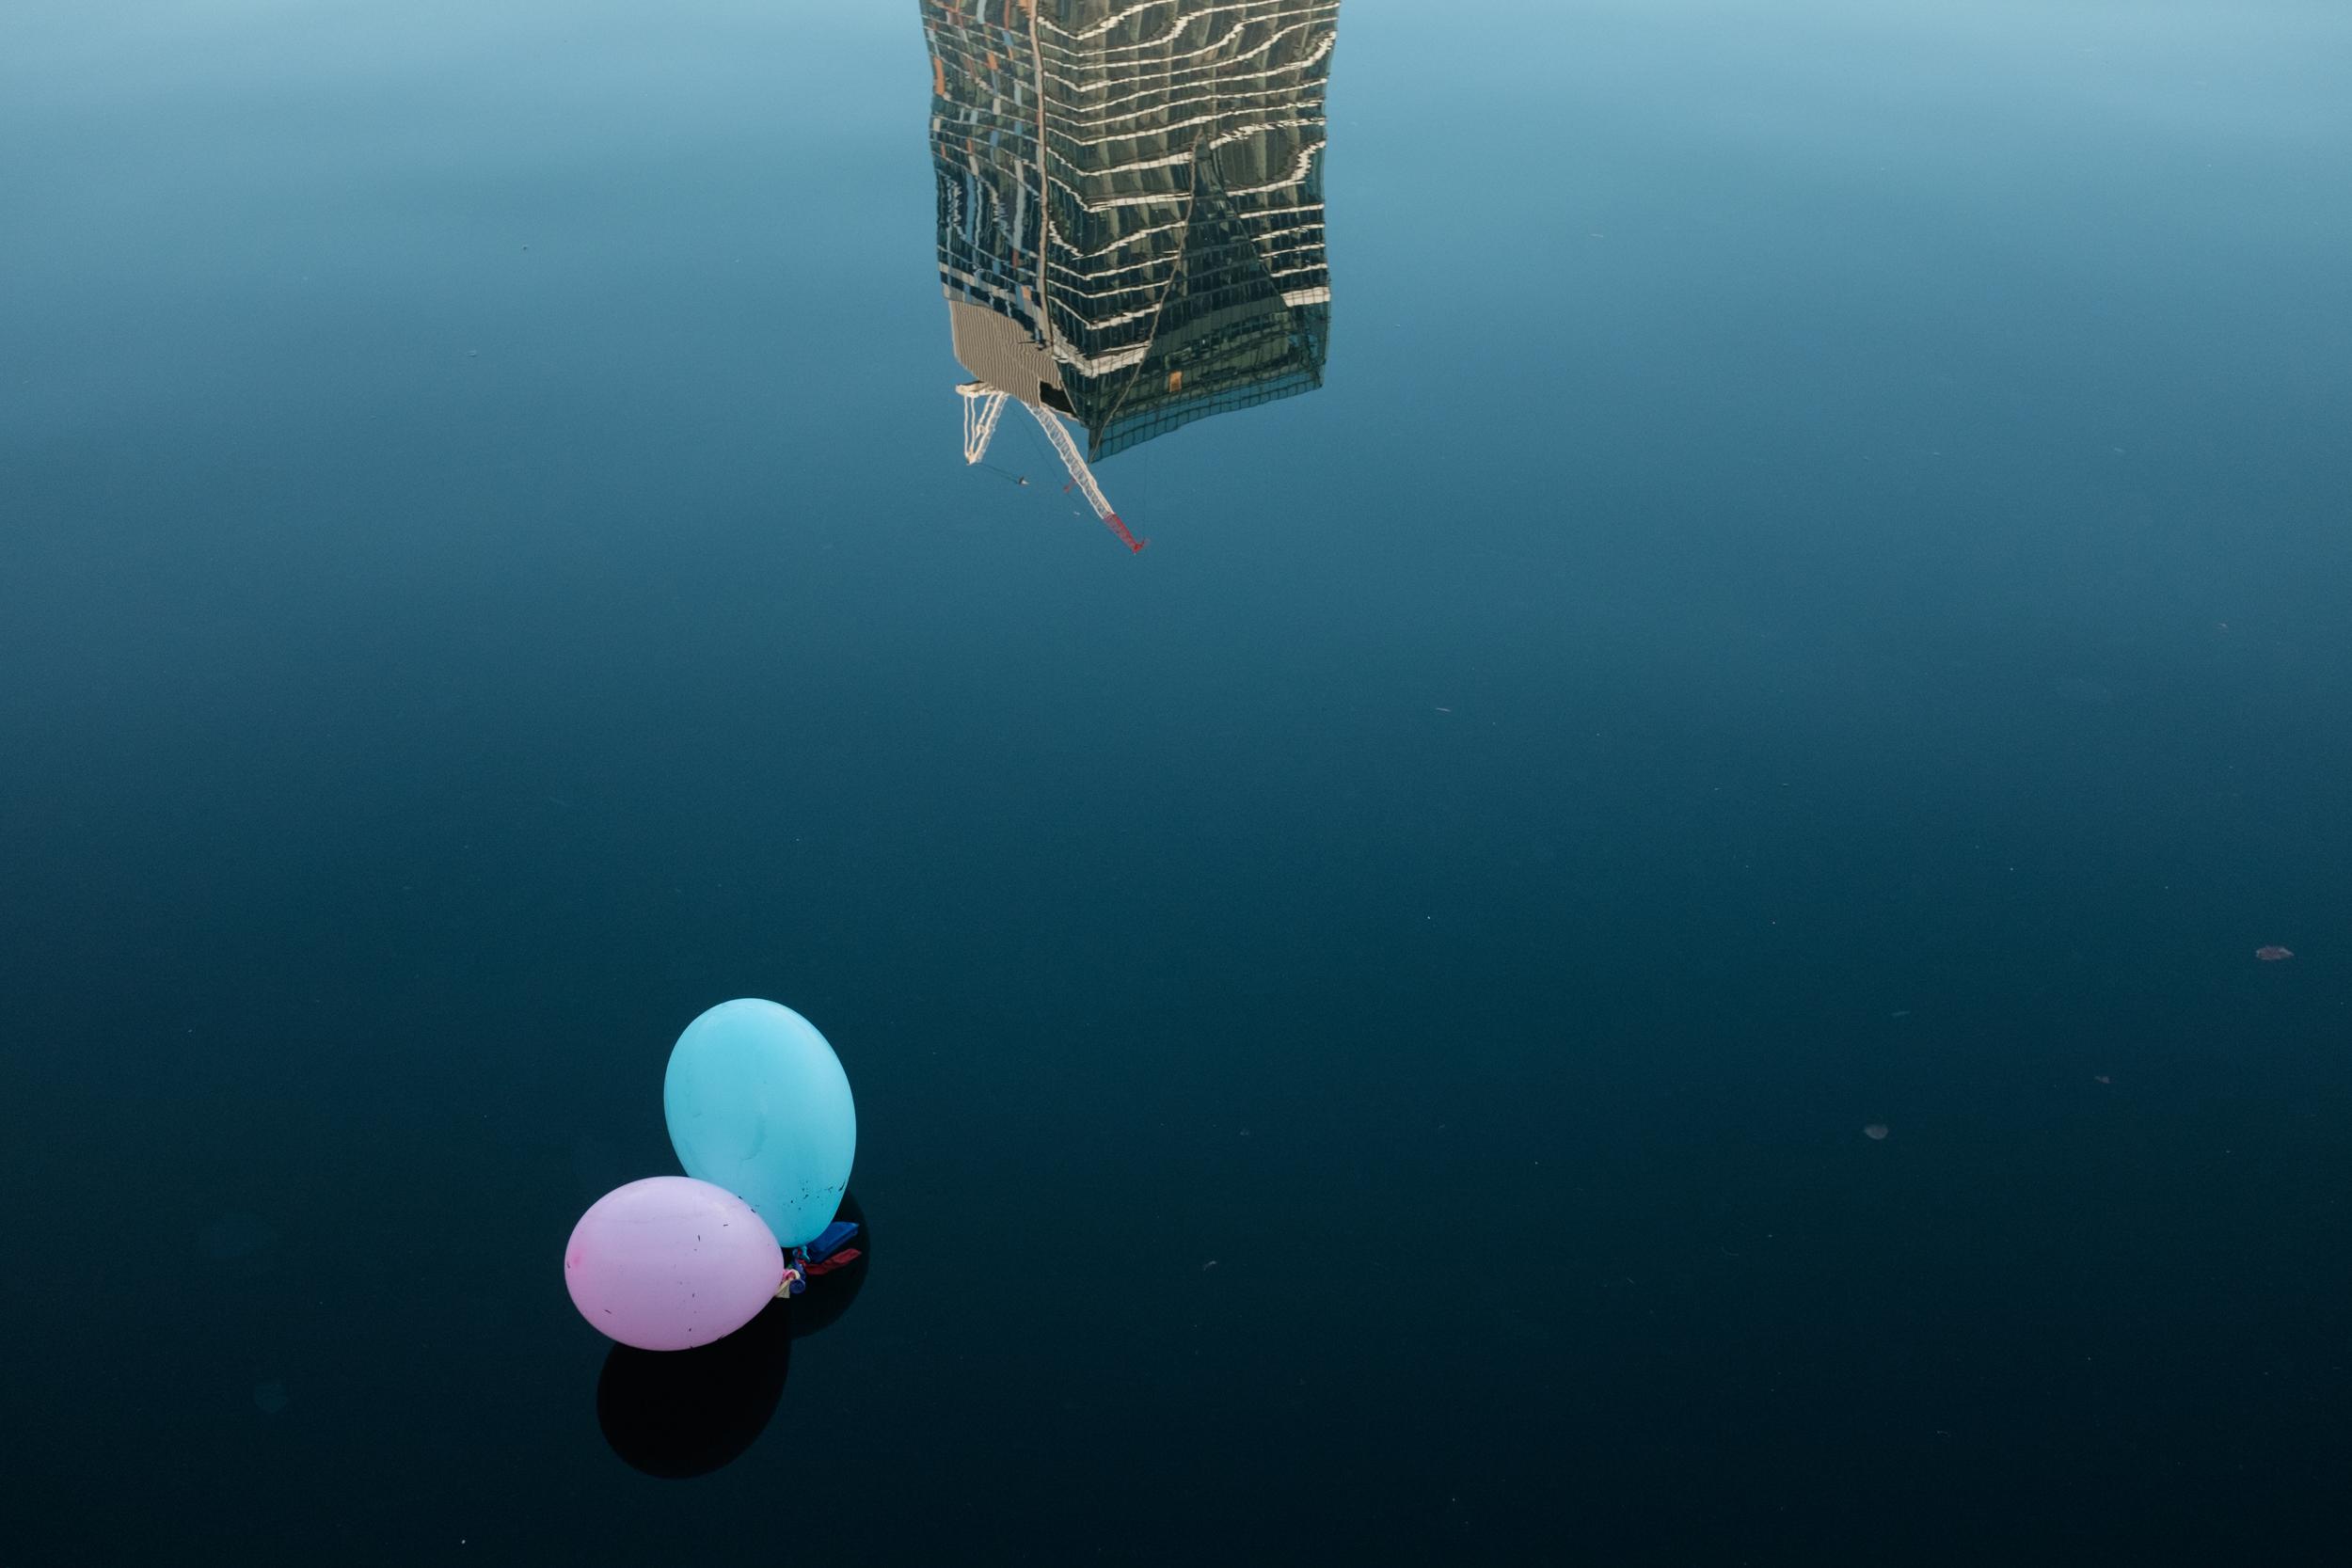 09_Jonathan_Pui_Australian_street_photography_pink_blue_balloon_building_aussie_street_sydney.JPG